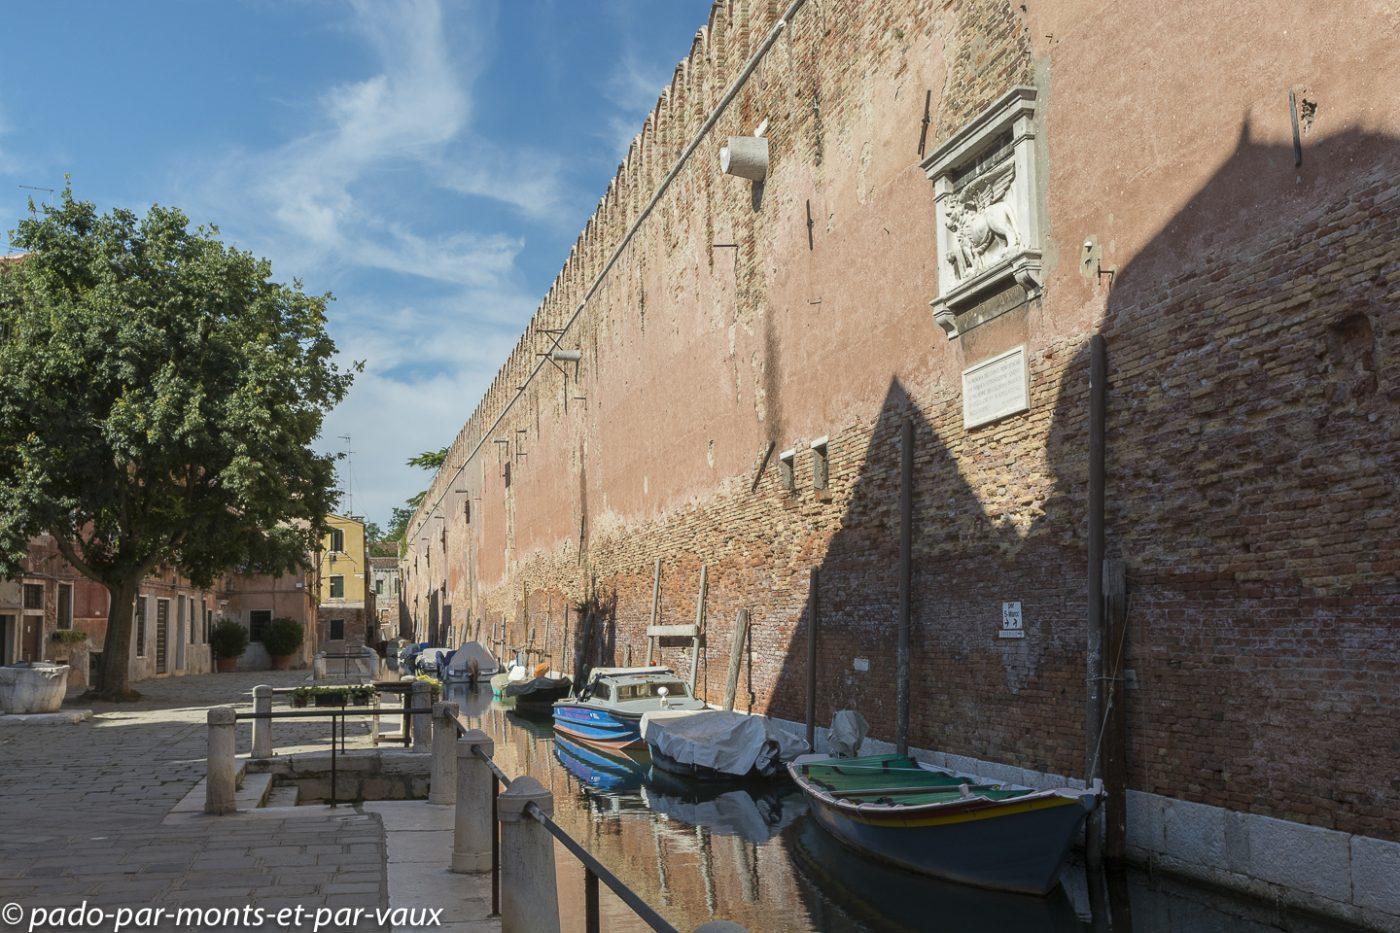 Venise - Fondamenta de Penini